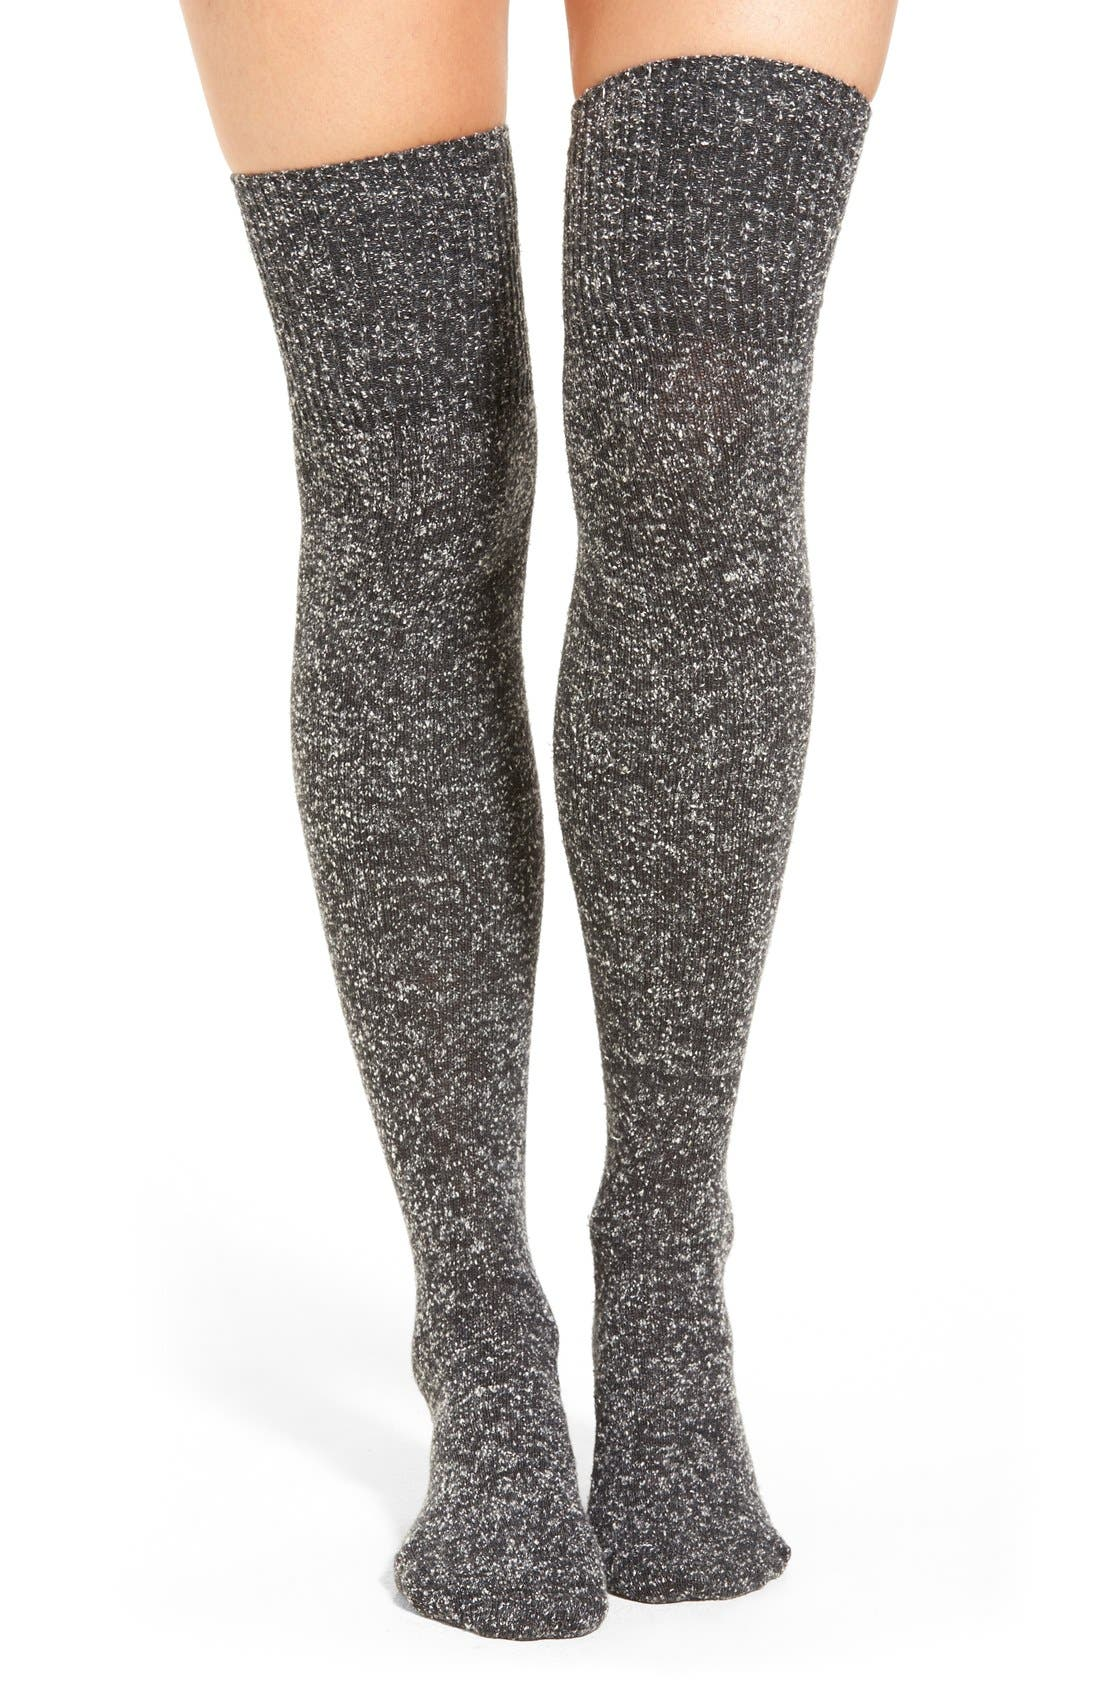 Main Image - Lemon 'Snowfall Tweed' Over the Knee Socks